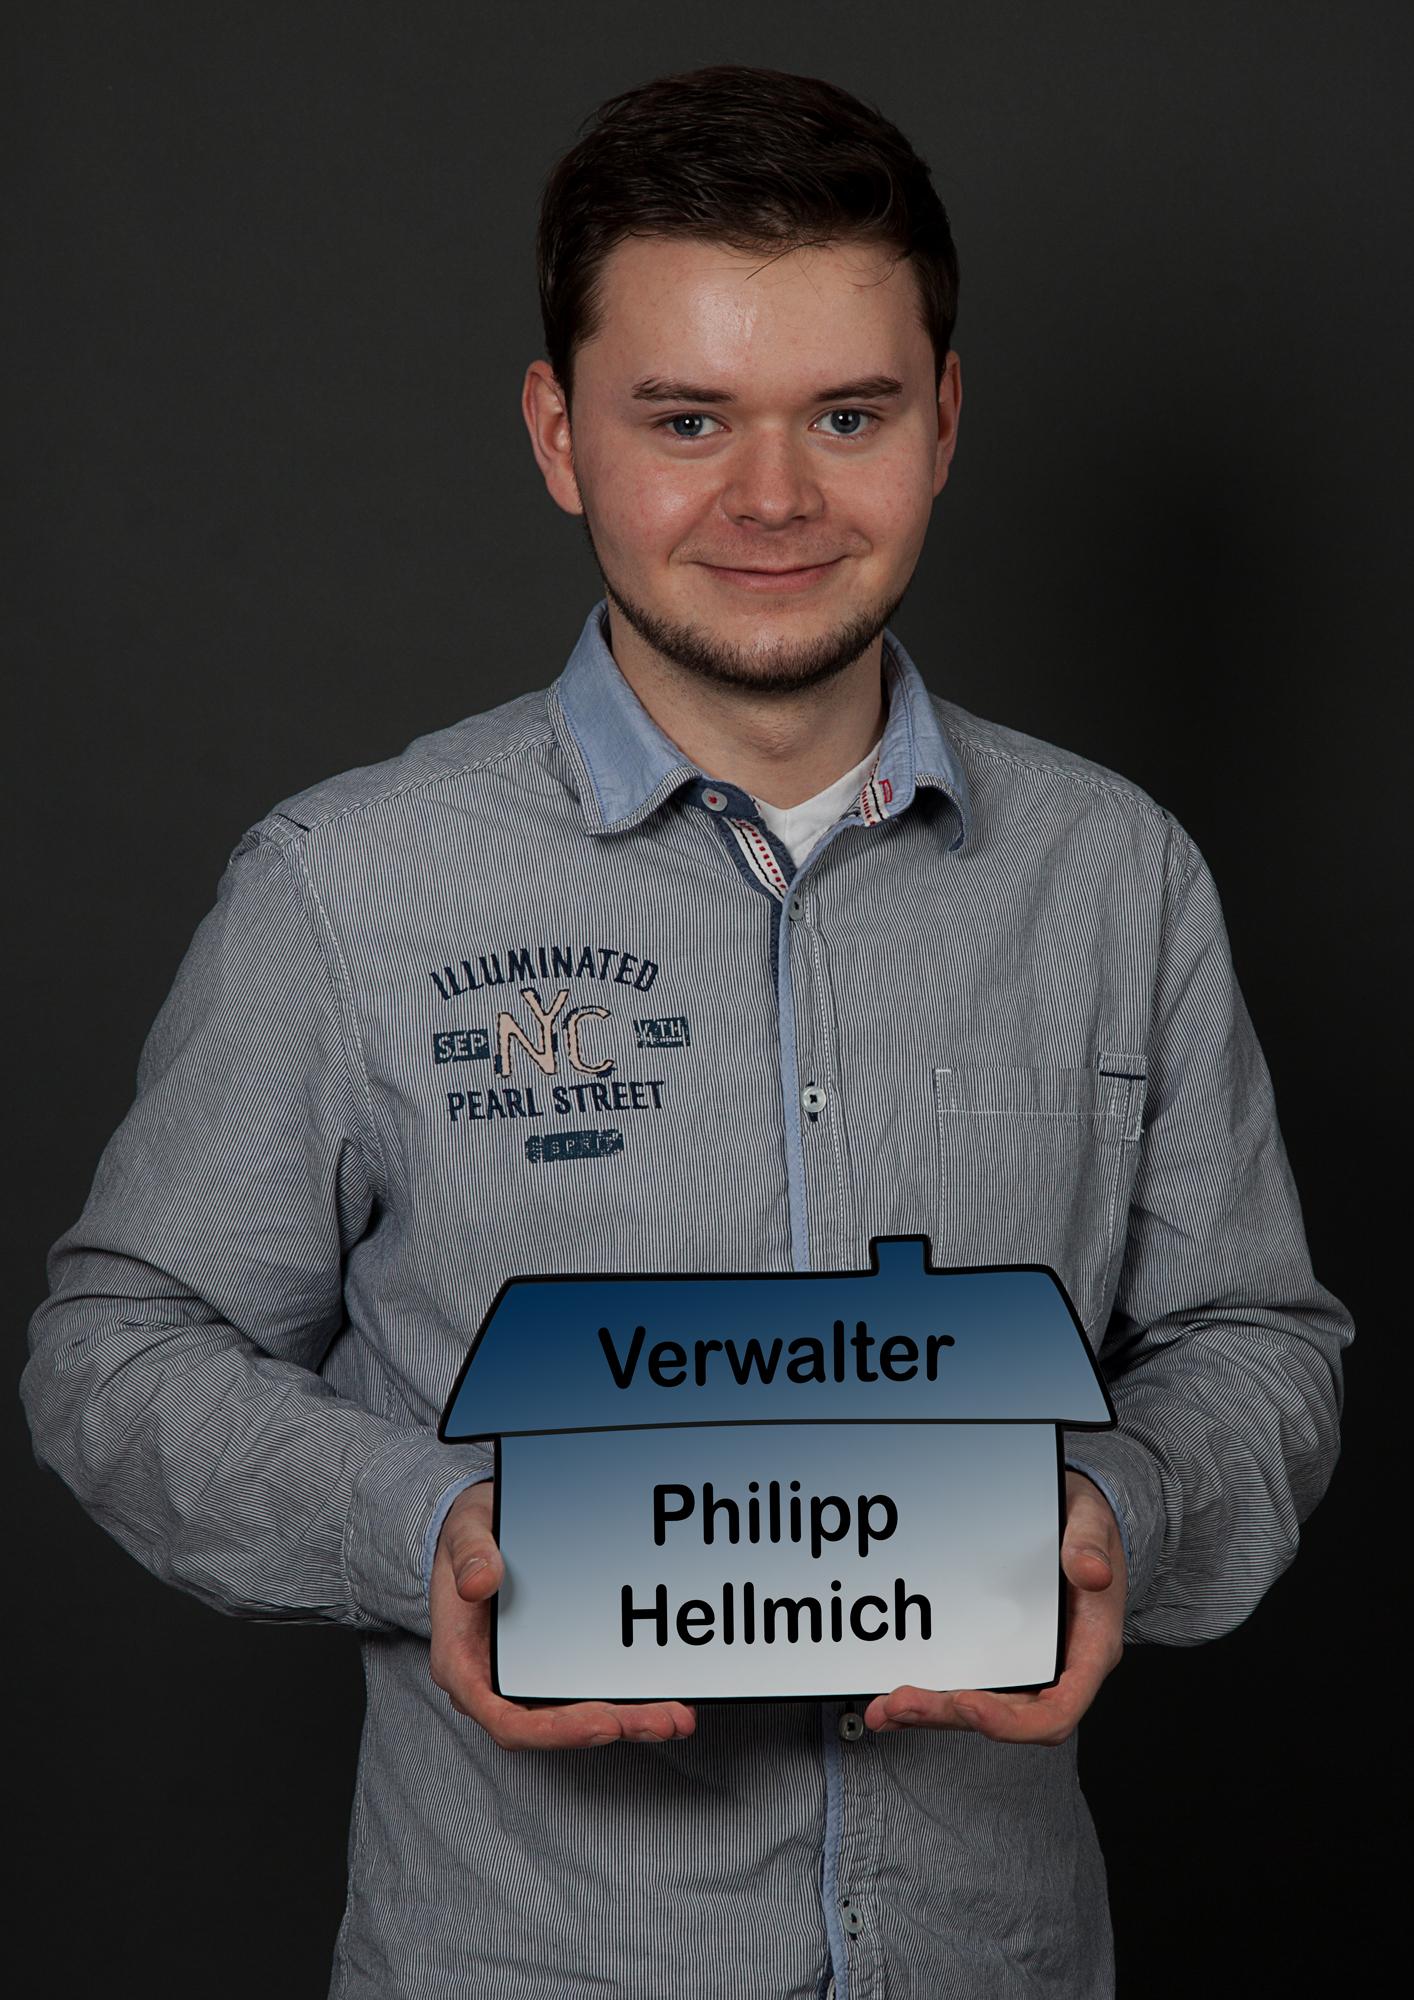 Philipp Hellmich